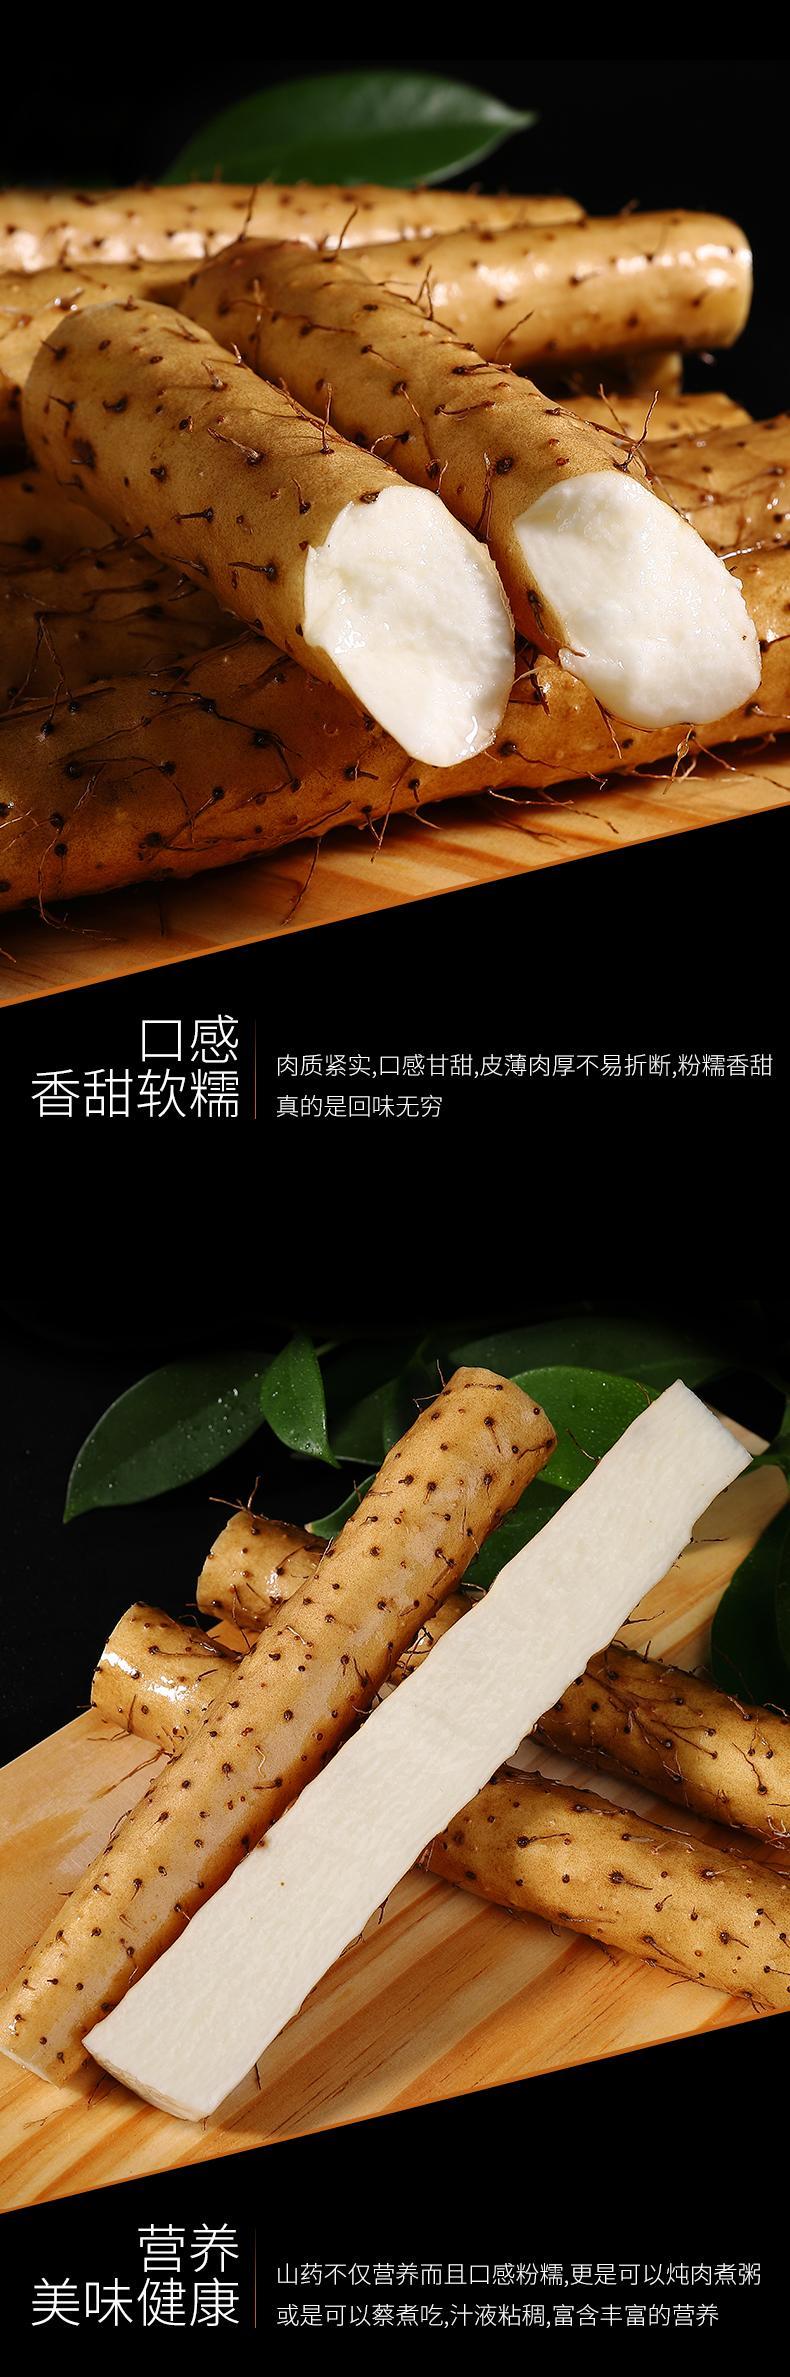 http://b2bwings-goods-image.oss-cn-shenzhen.aliyuncs.com/436c60eb-dec8-4fdd-99b8-6d8e08f1aca9.jpg